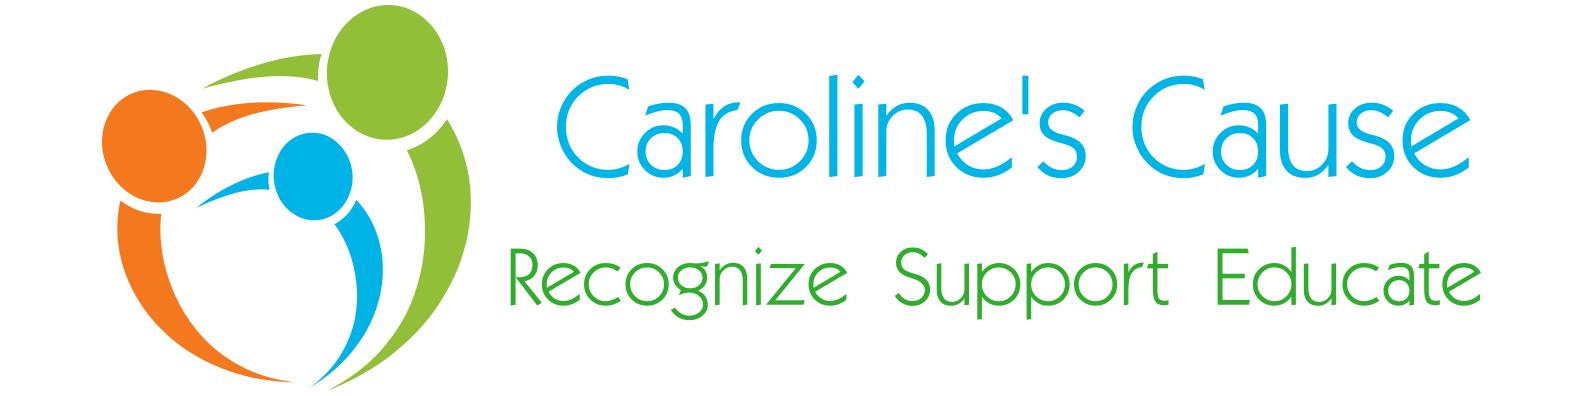 Caroline's Cause